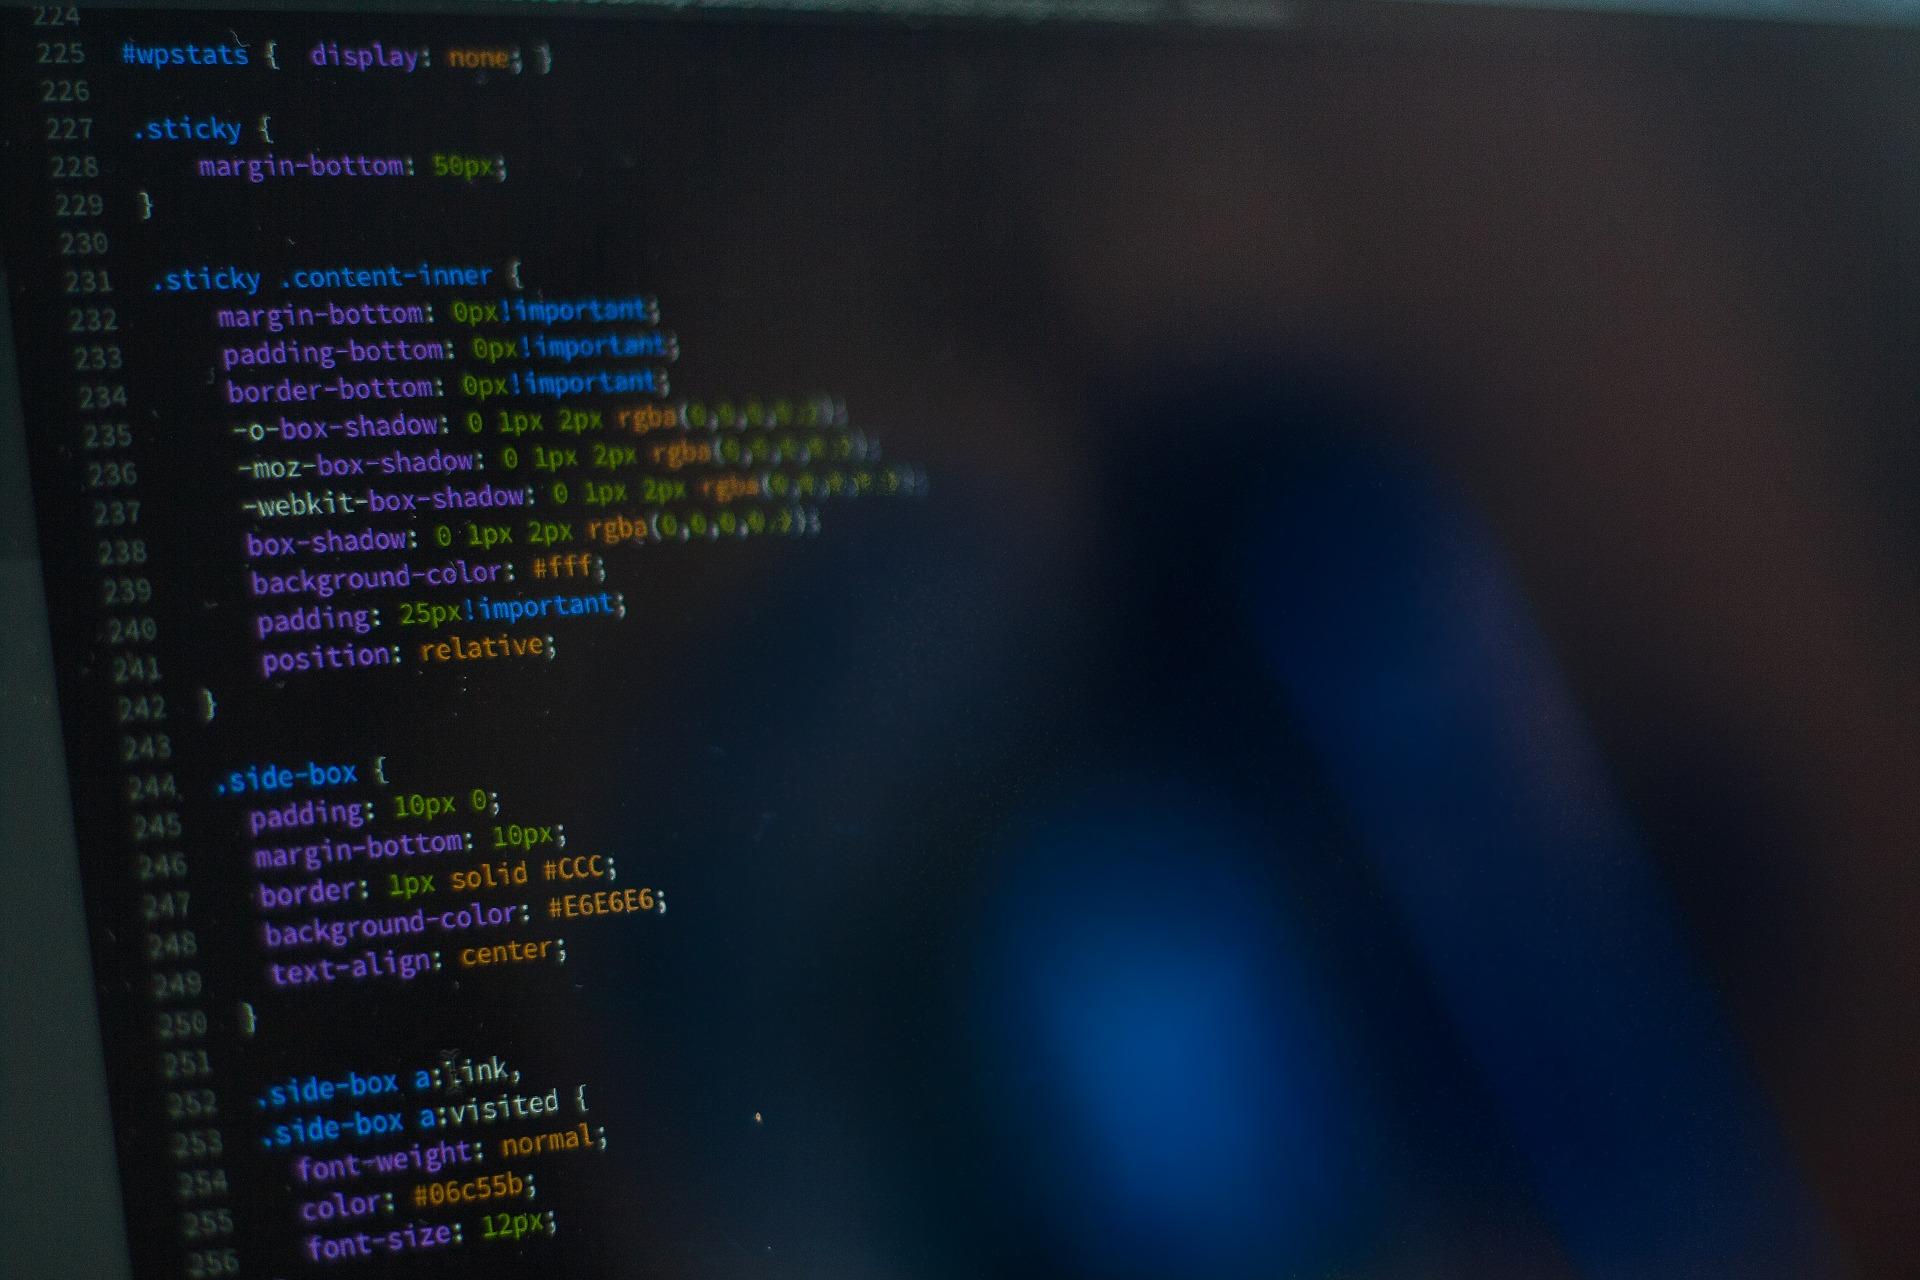 code 1839877 1920 - wordpressのショートコードの作成方法・使い方・注意点まとめ